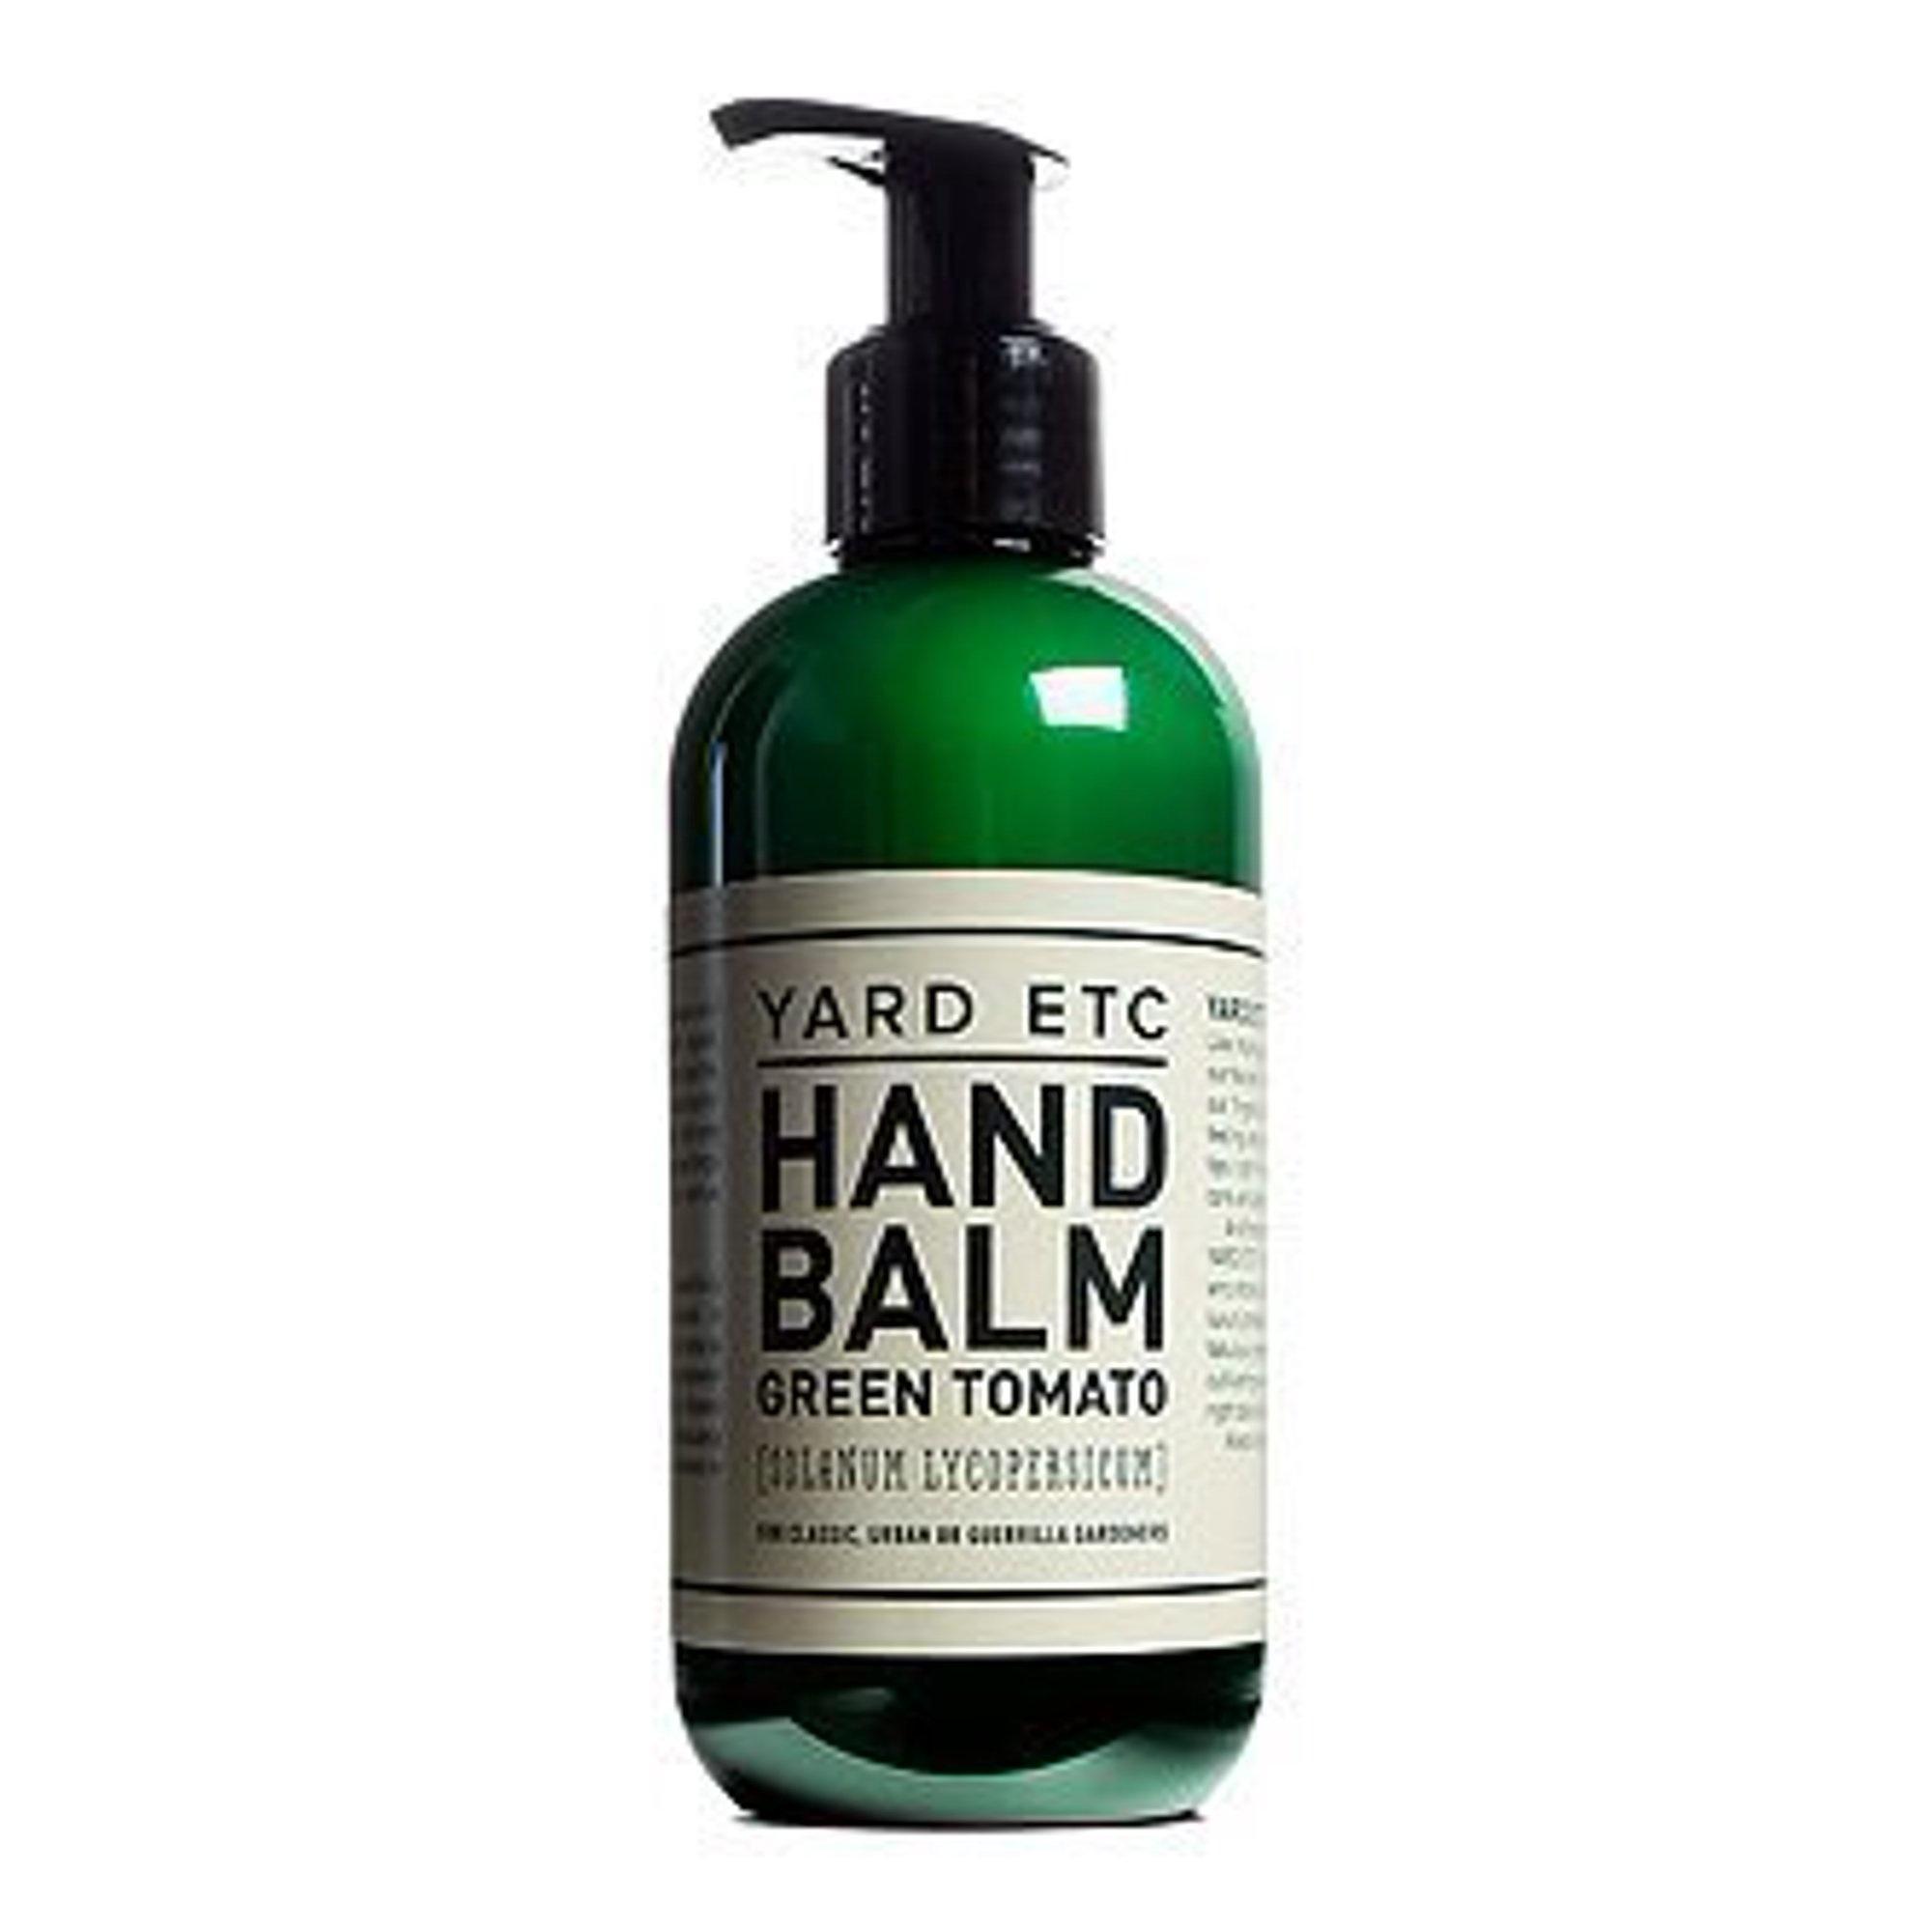 Hand Balm - Green Tomato-1